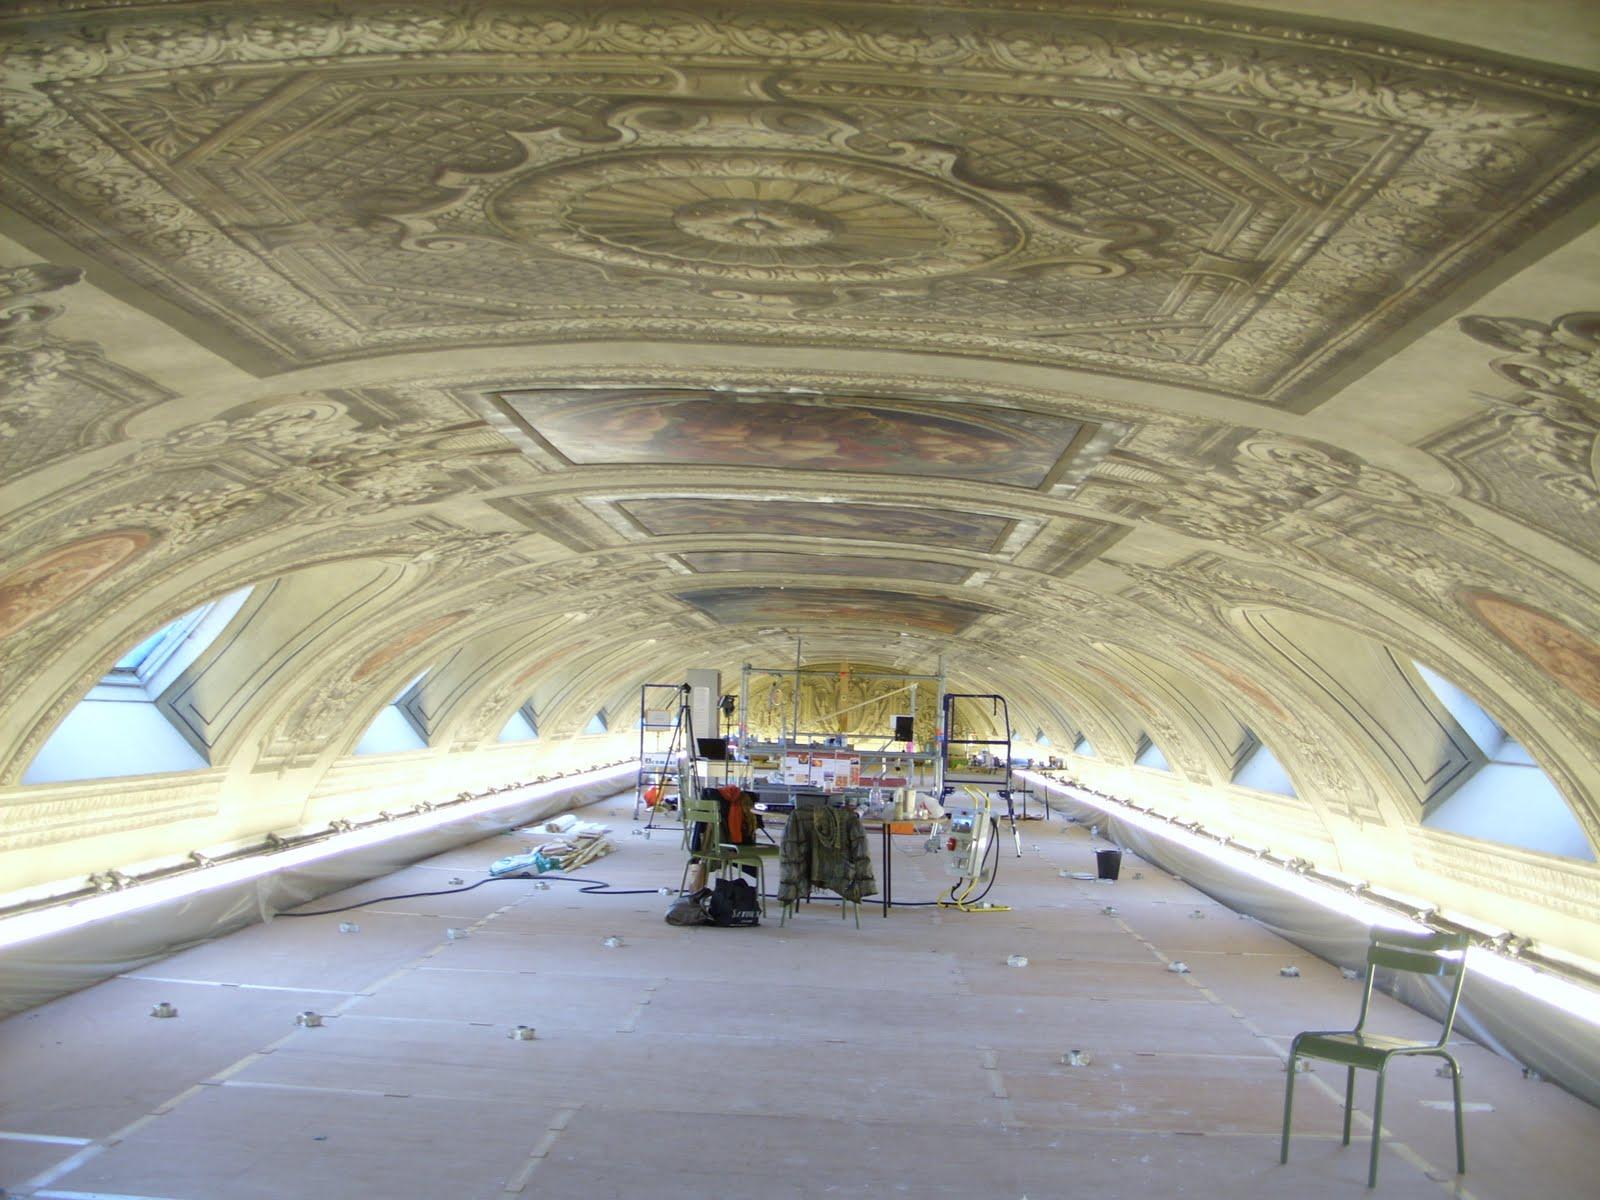 Pauline restaure peintures murales - Retouche peinture plafond ...